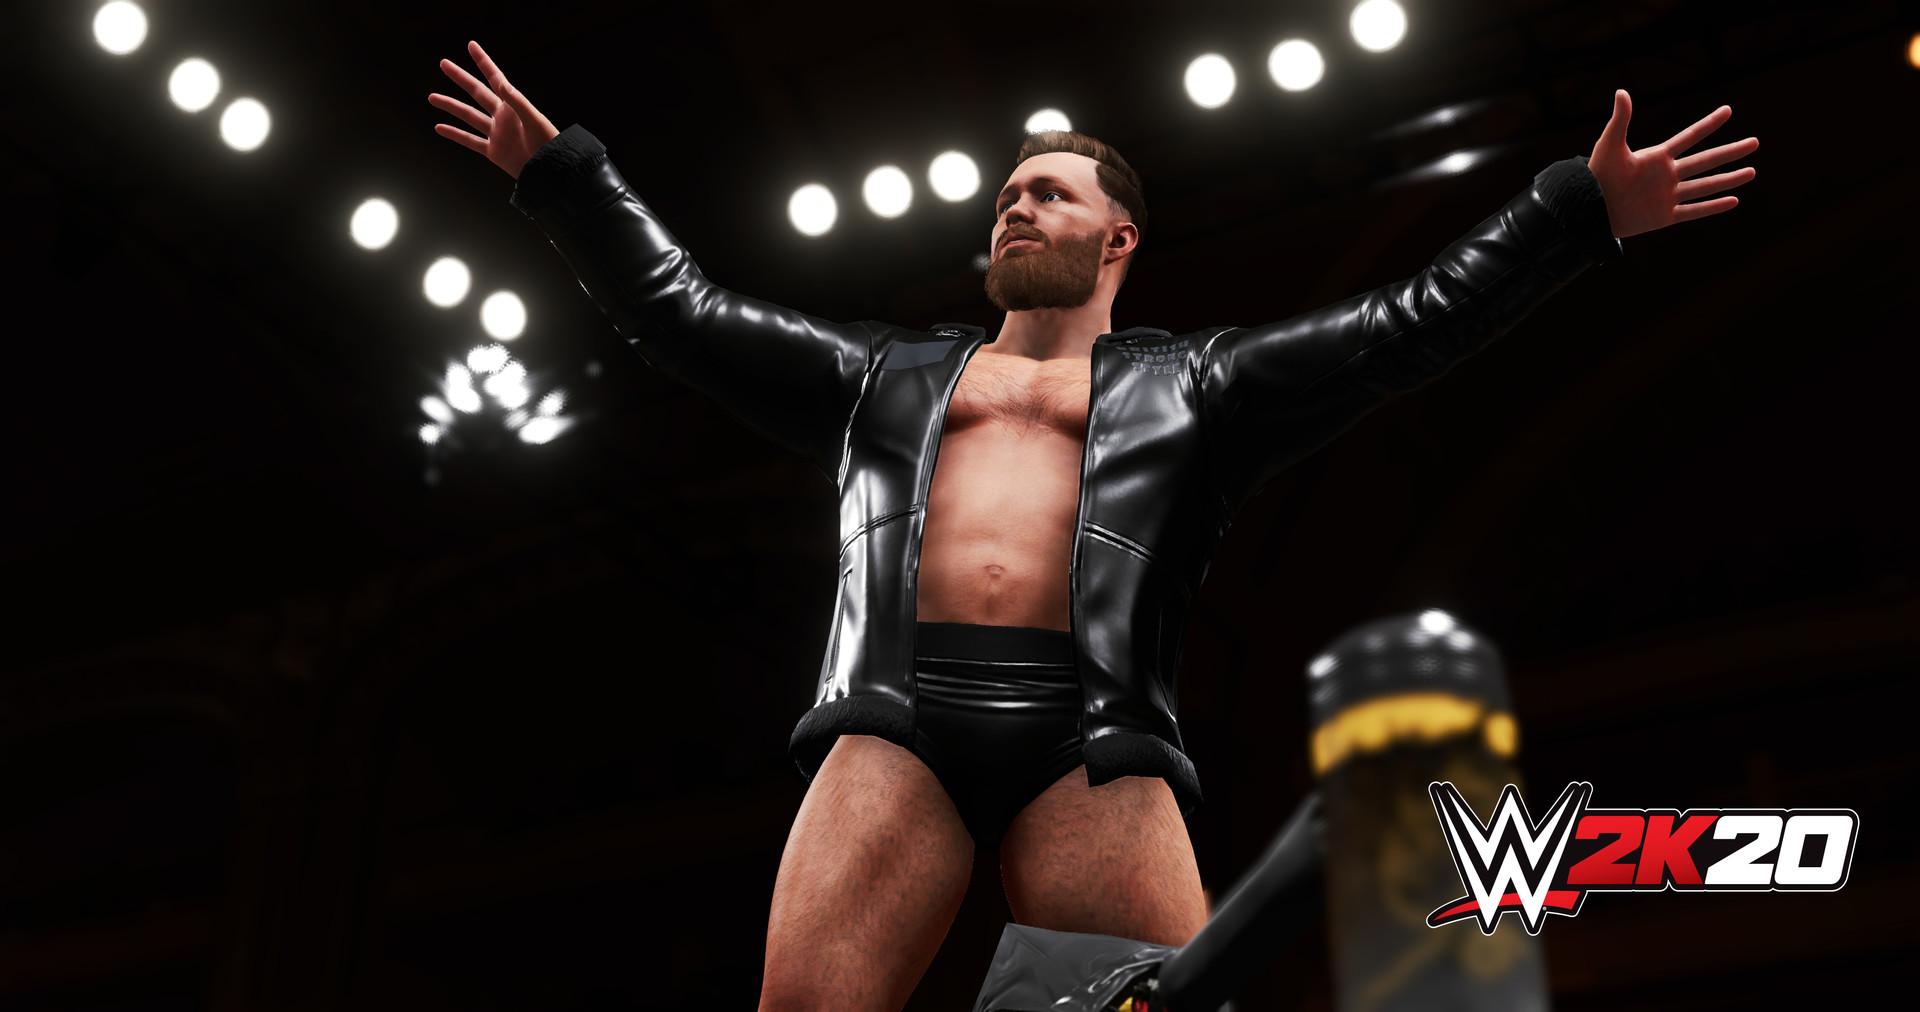 WWE 2K20 [2019|Eng|Multi6]